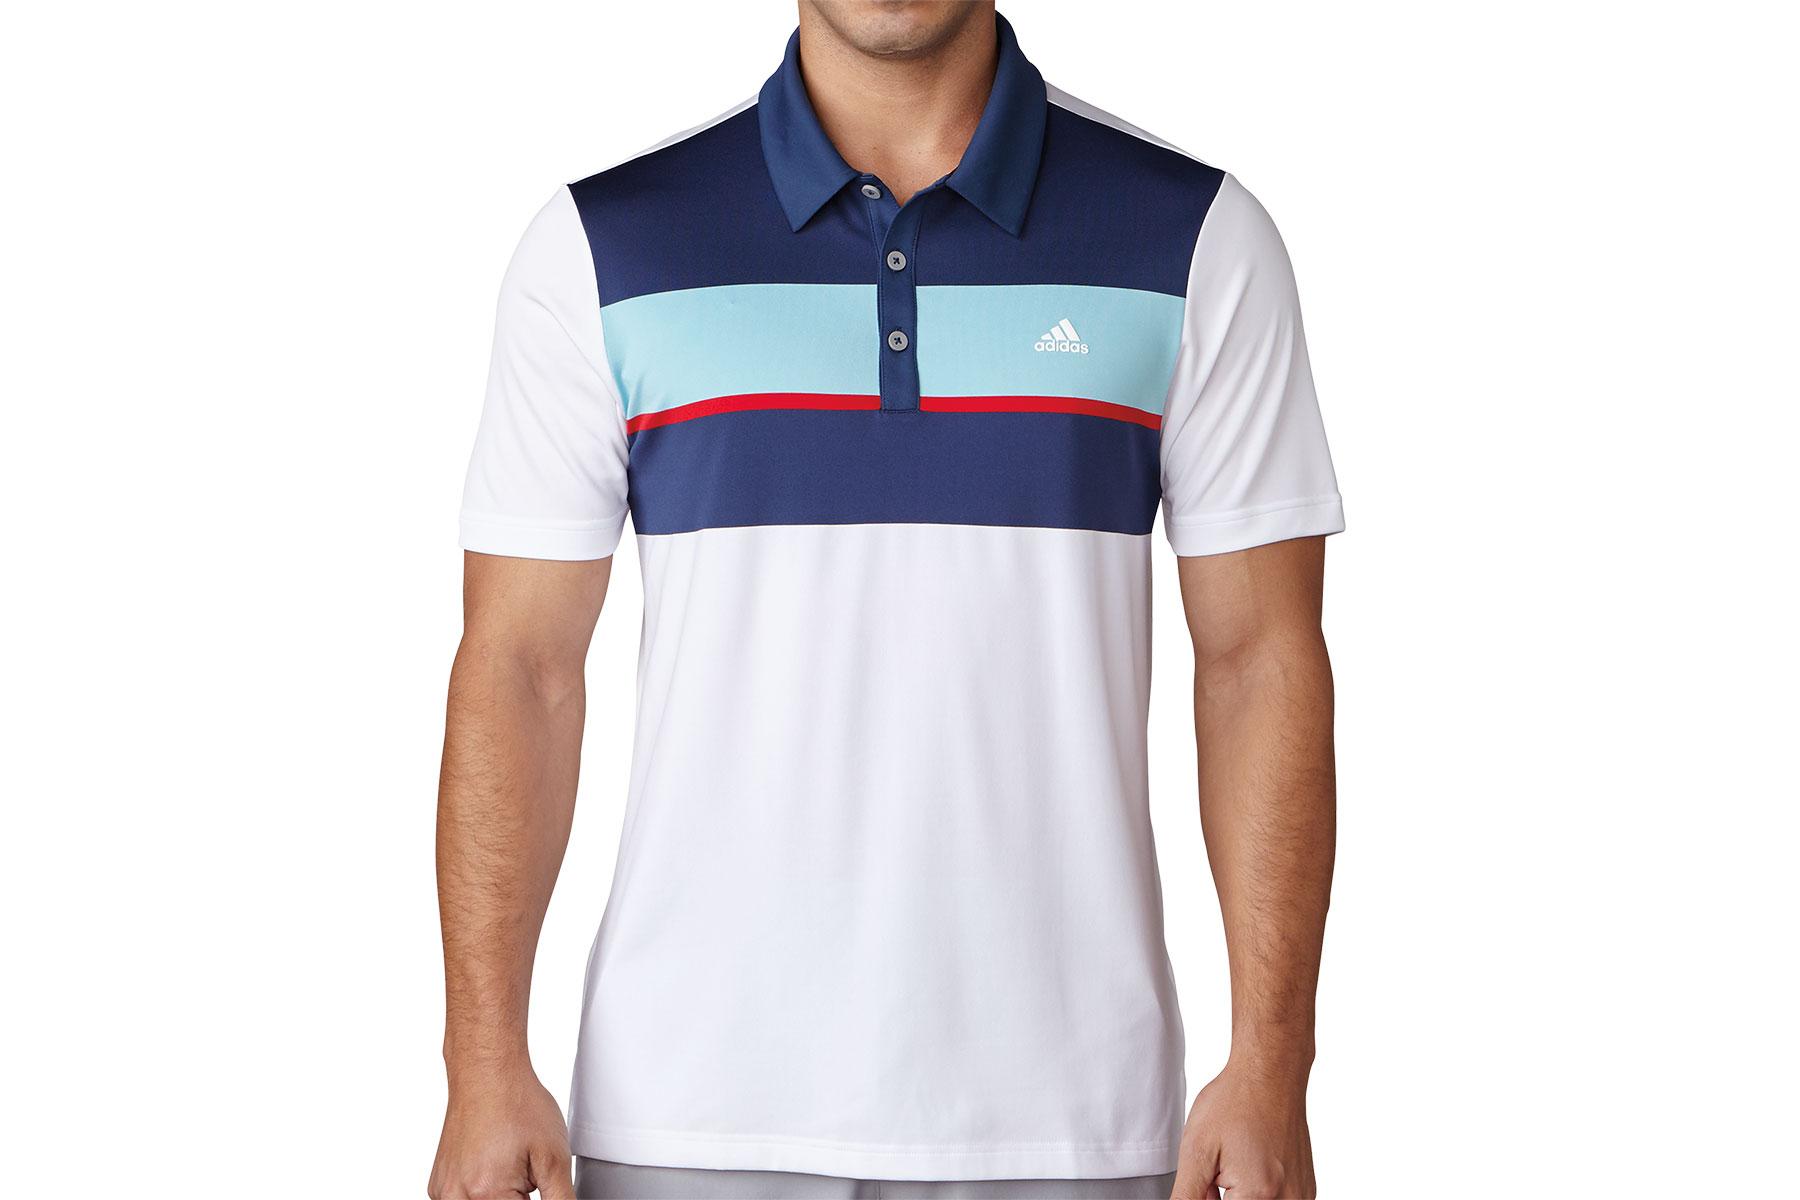 Adidas golf chest block polo shirt online